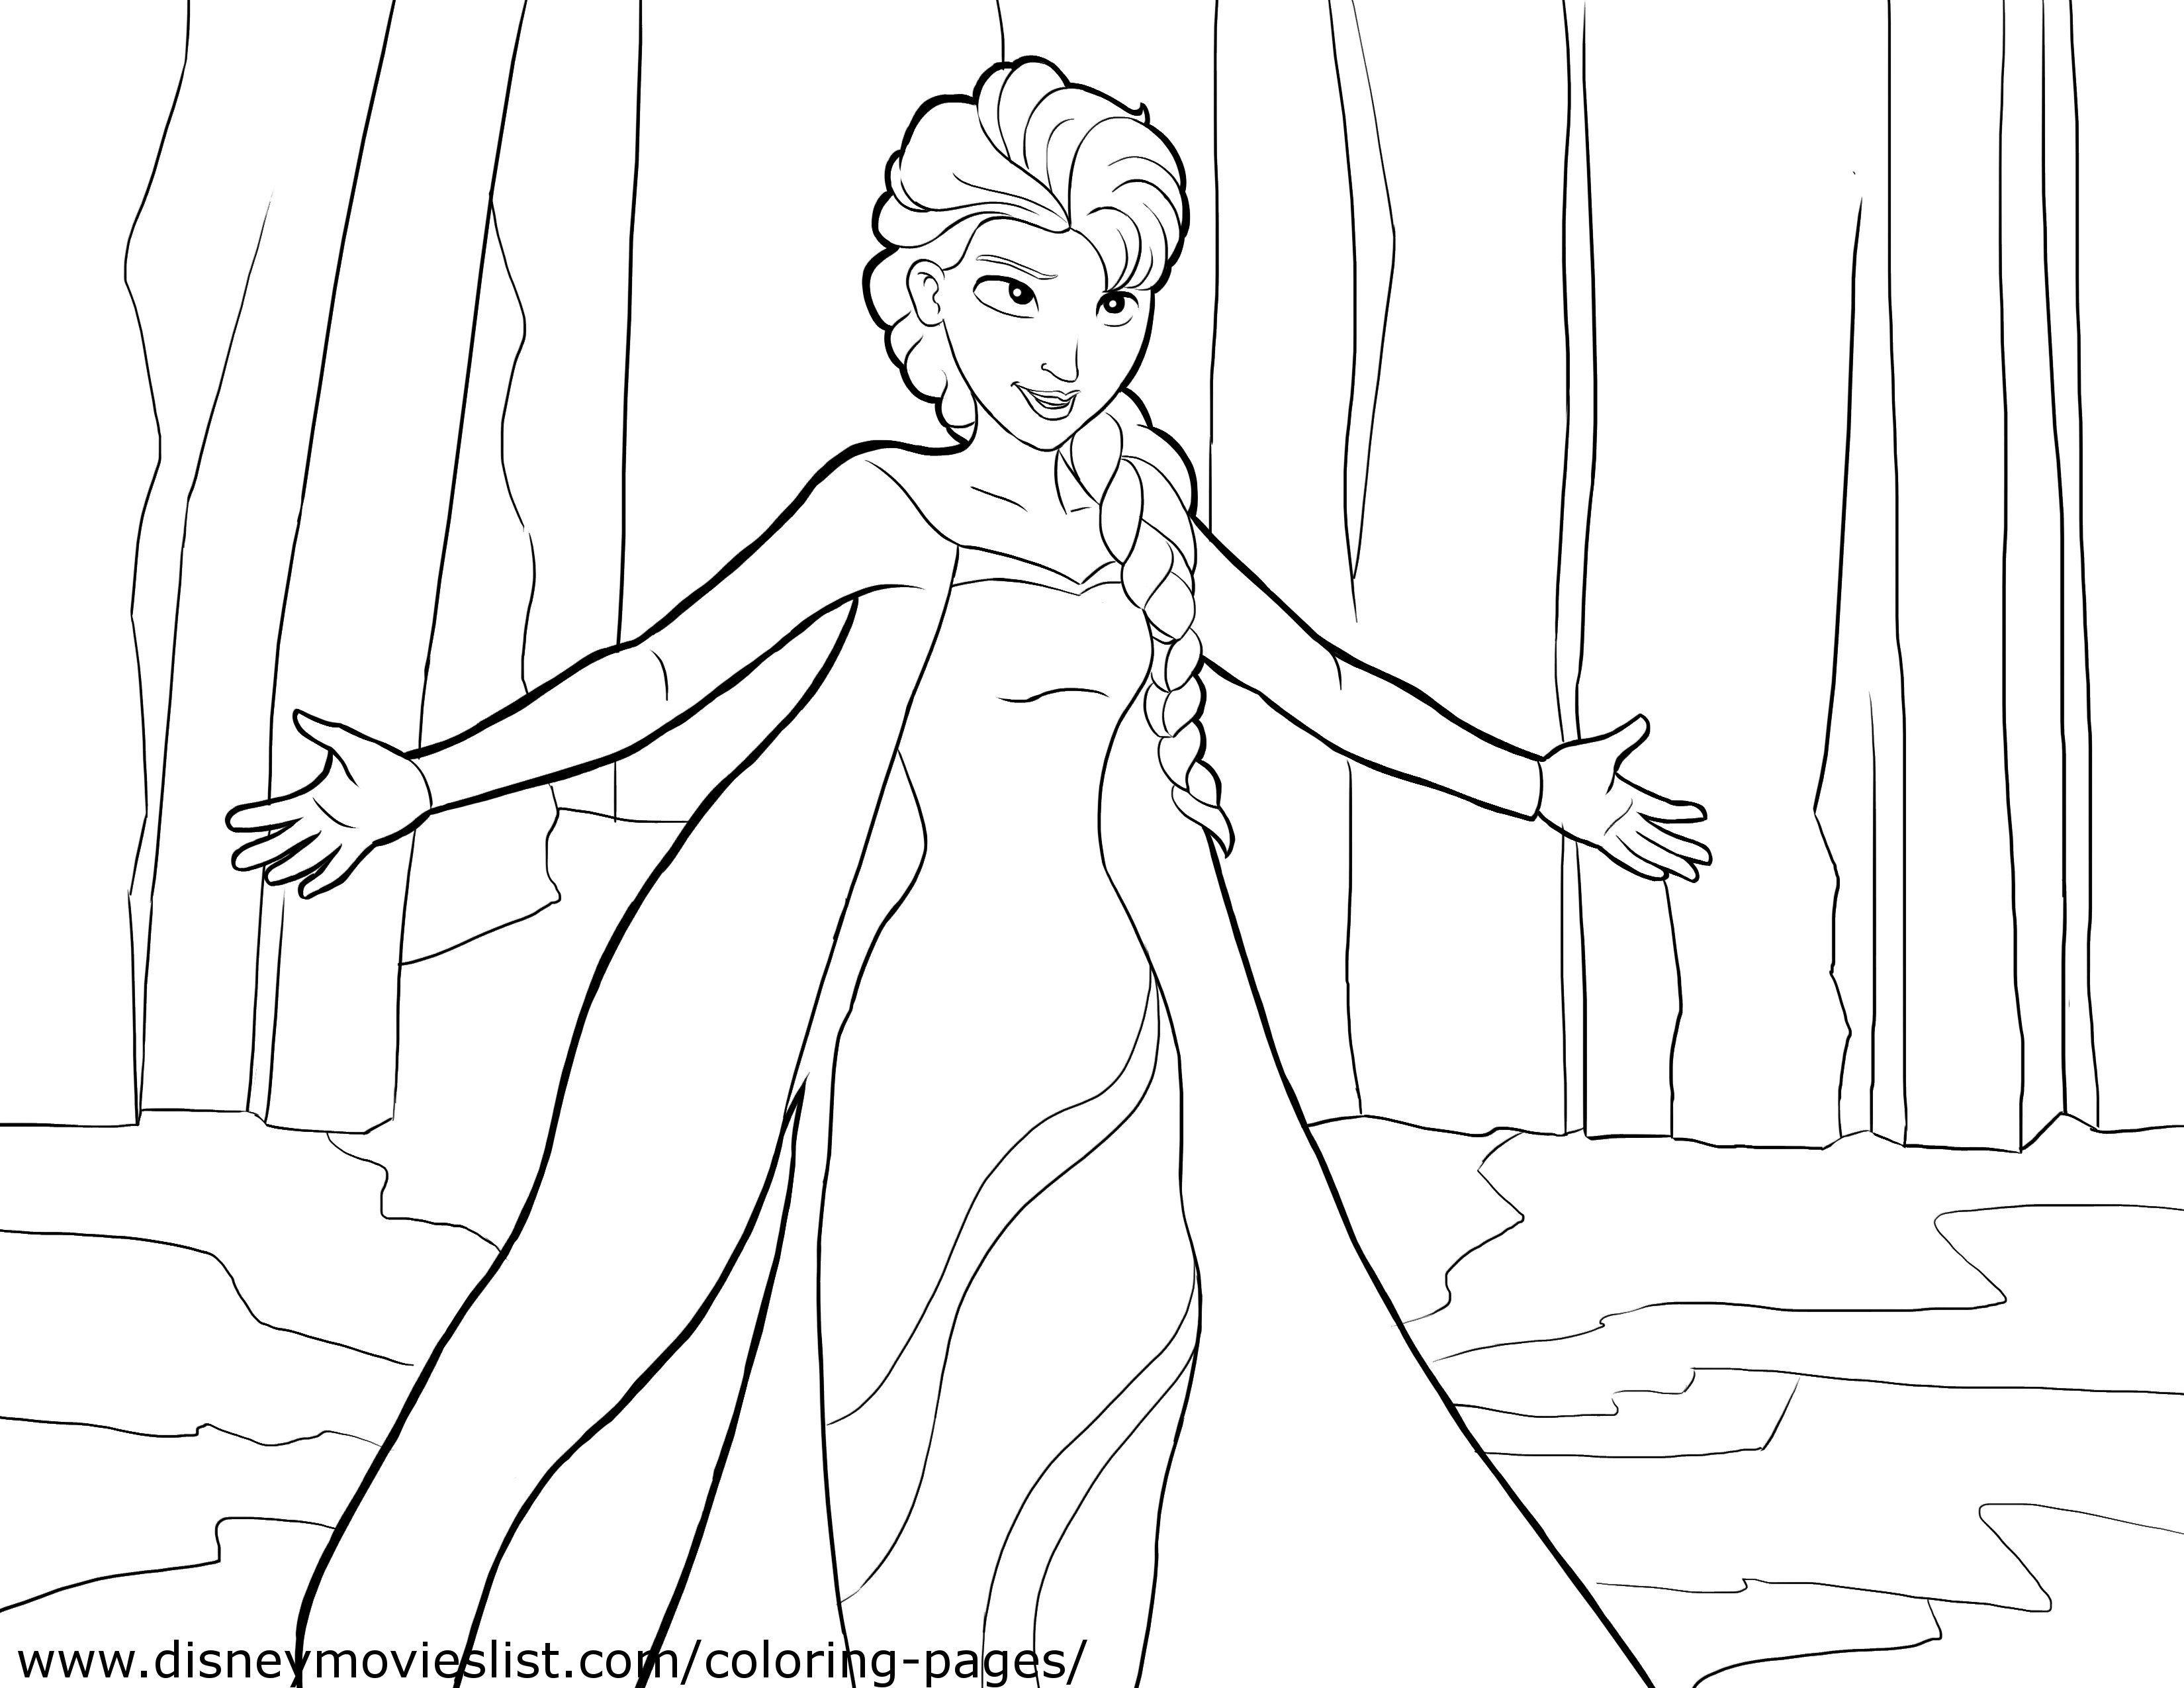 Frozen Coloring Pages Disney | Coloring Pages | Pinterest